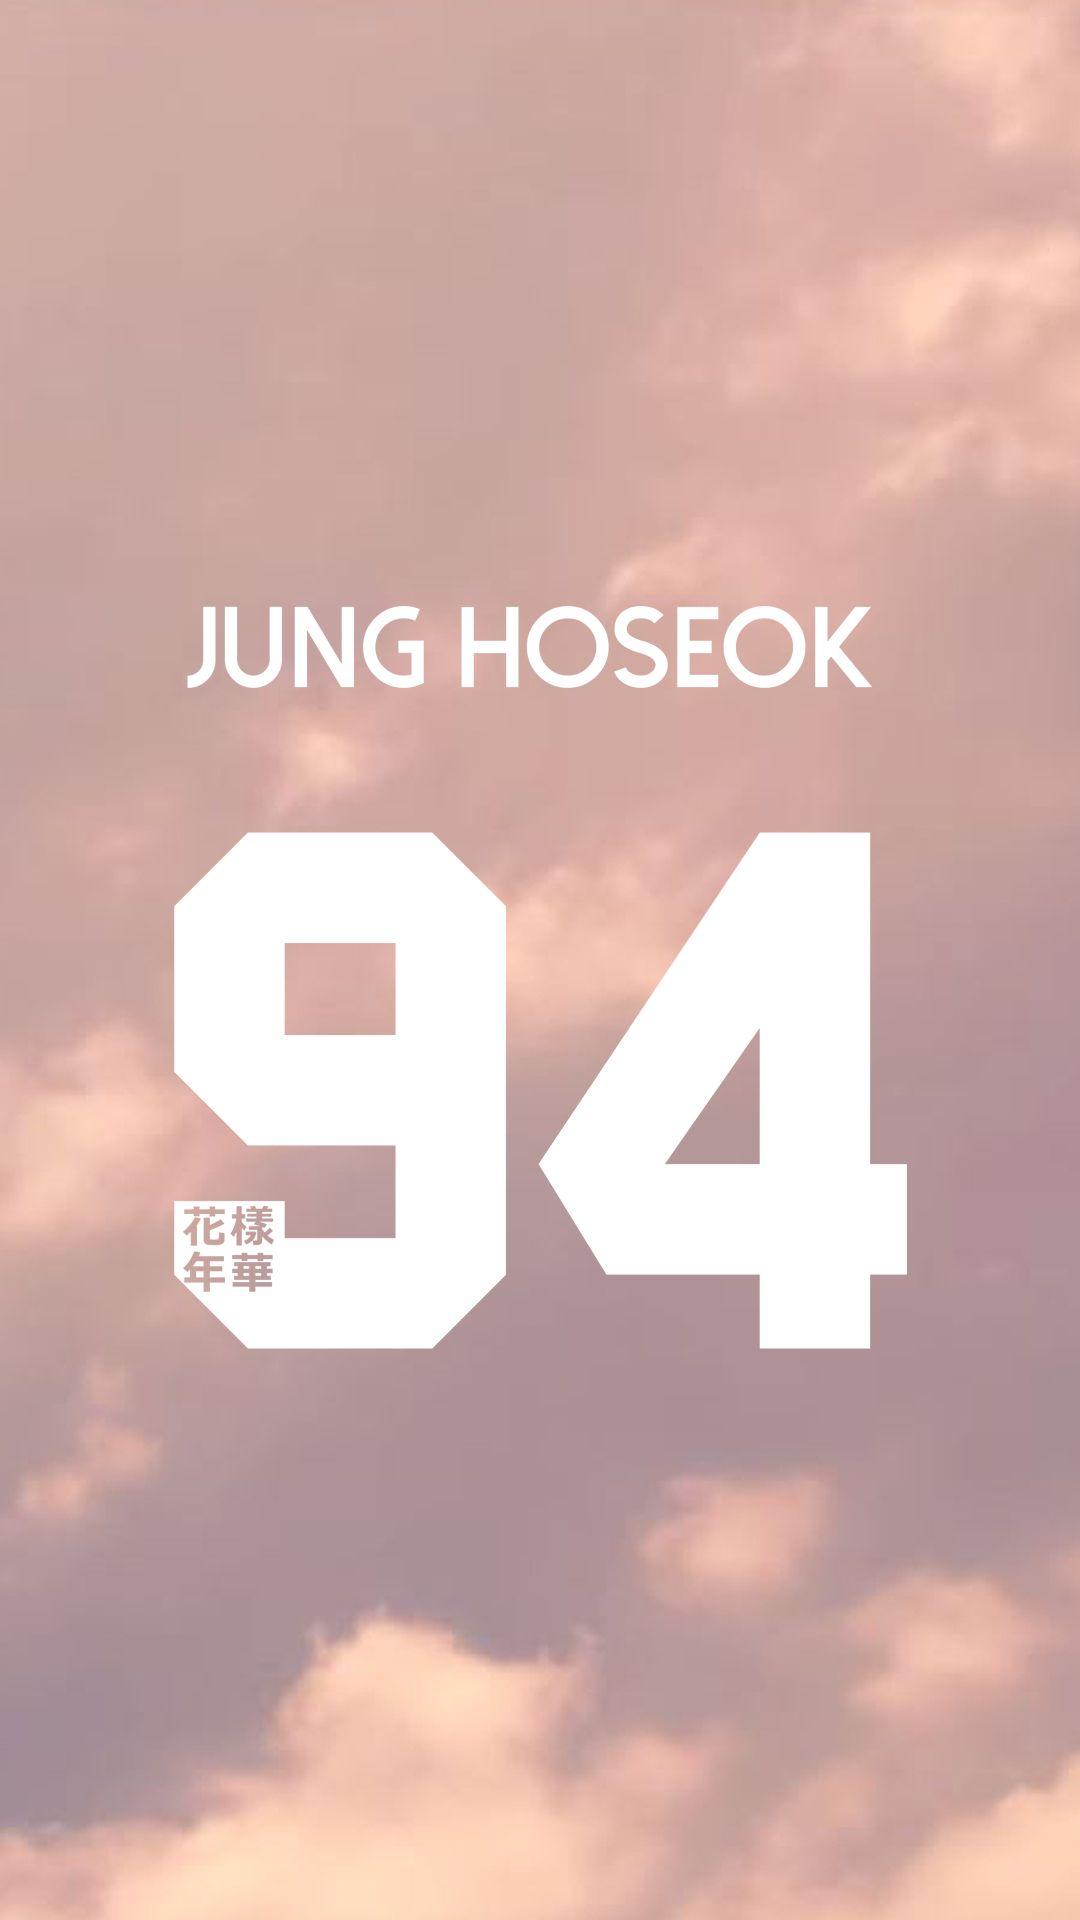 Bts iphone wallpaper tumblr - Jung Hoseok Wallpaper